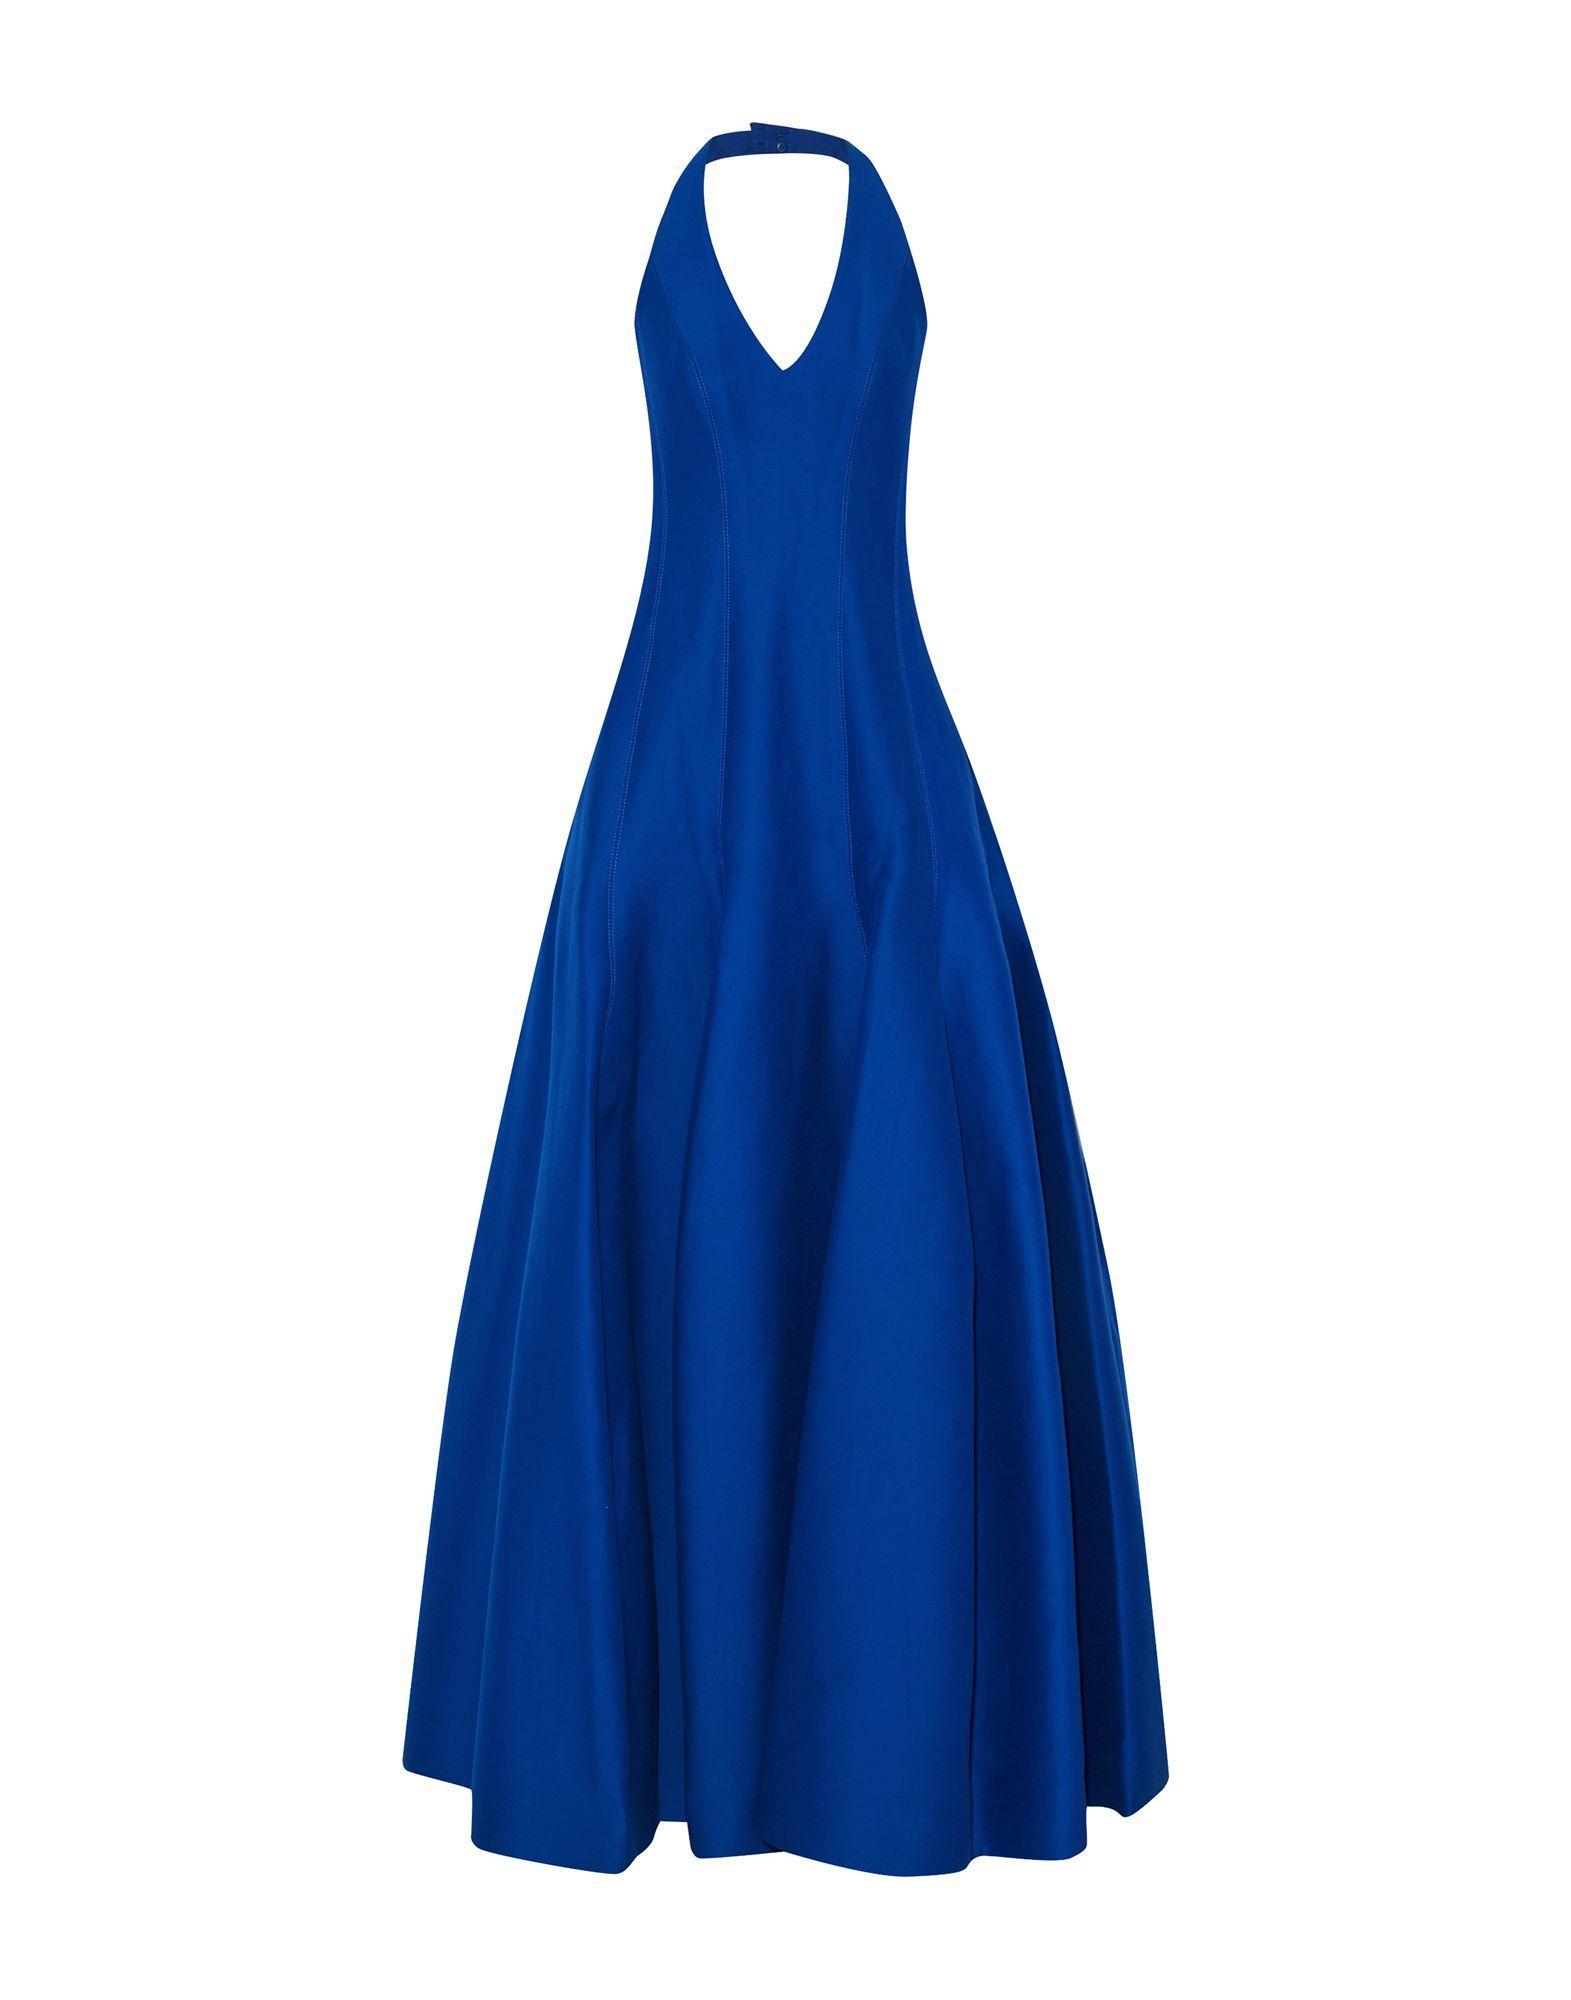 Halston Bright Blue Cotton Full Length Dress